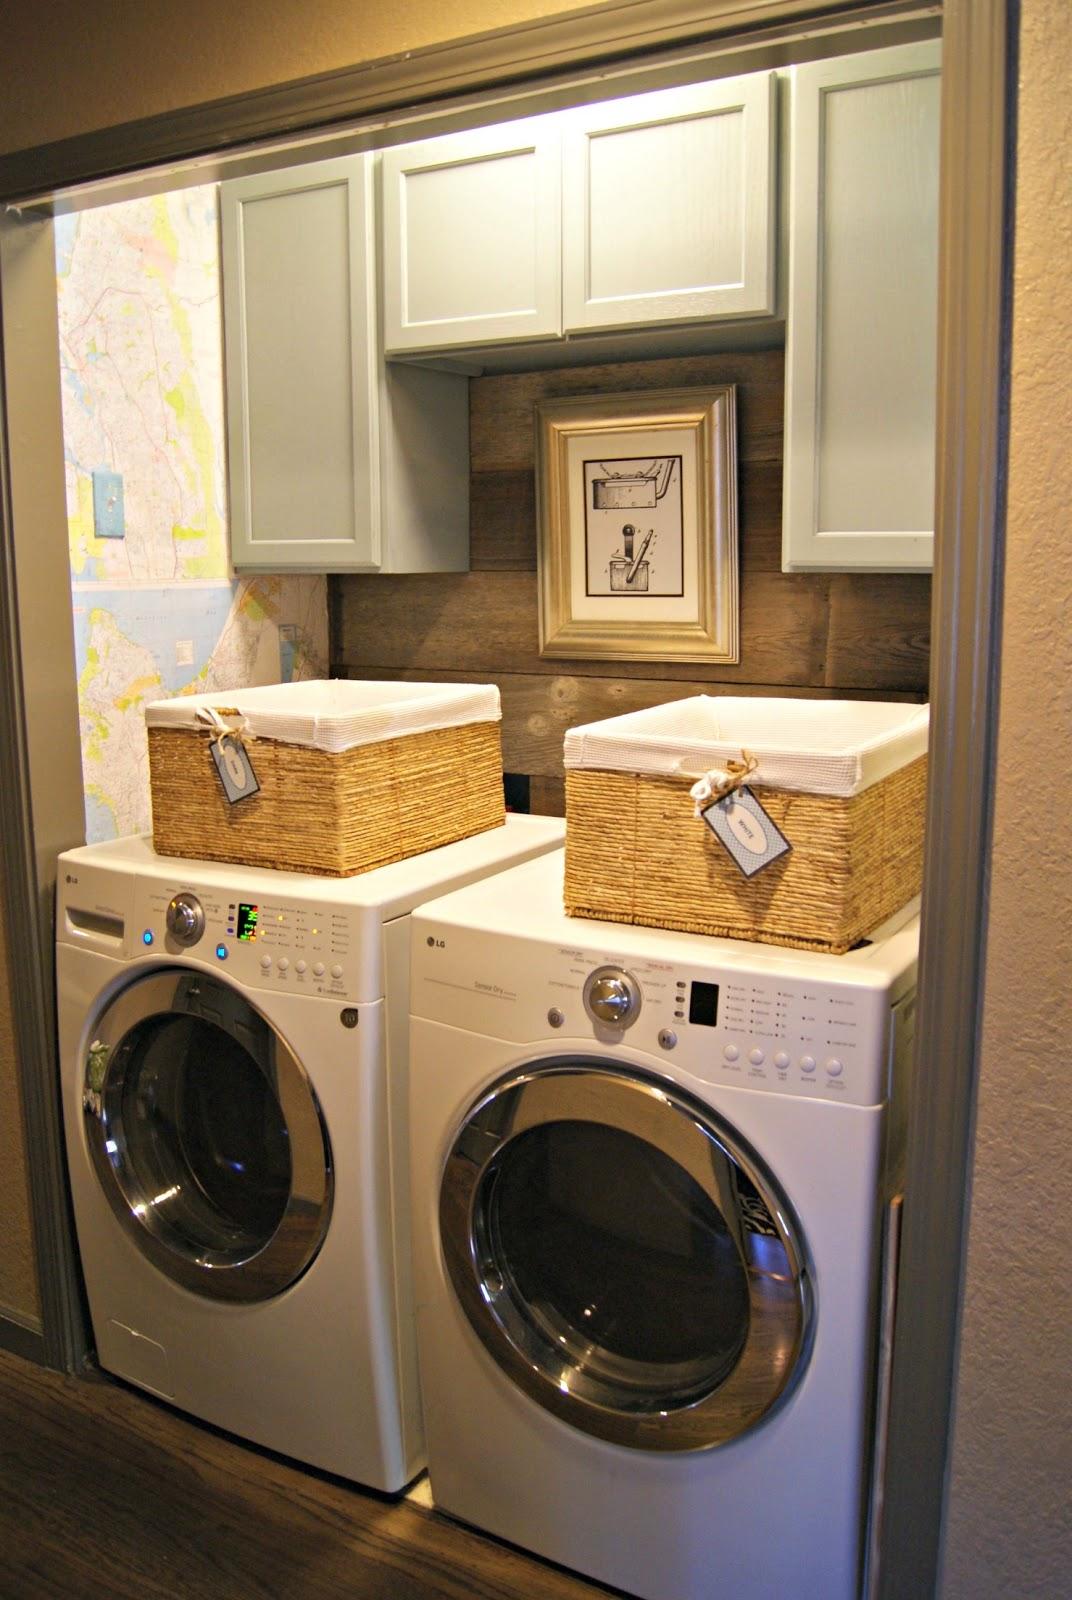 laundry room closet organization | Blessed {bles-id}: Laundry Closet